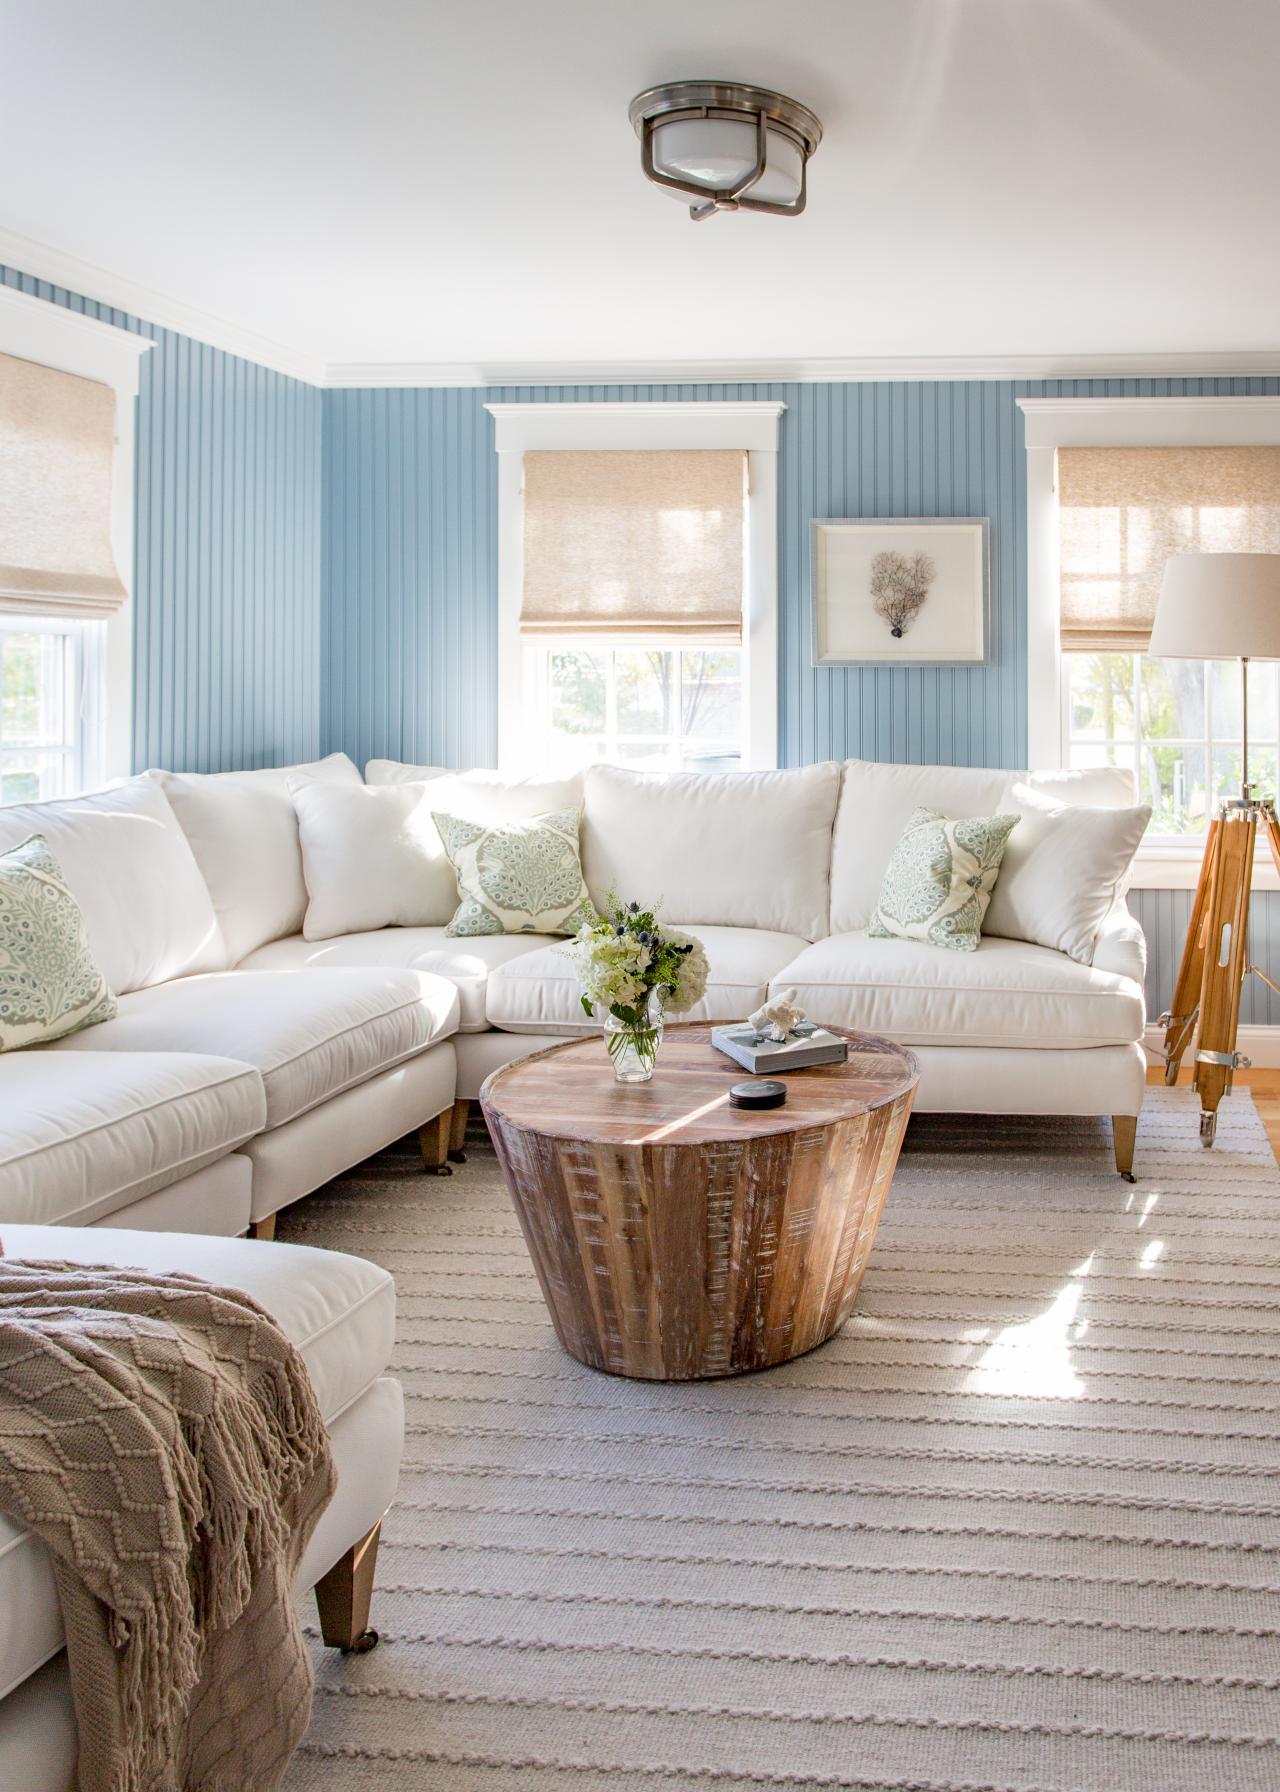 Coastal living room with cornflower blue walls